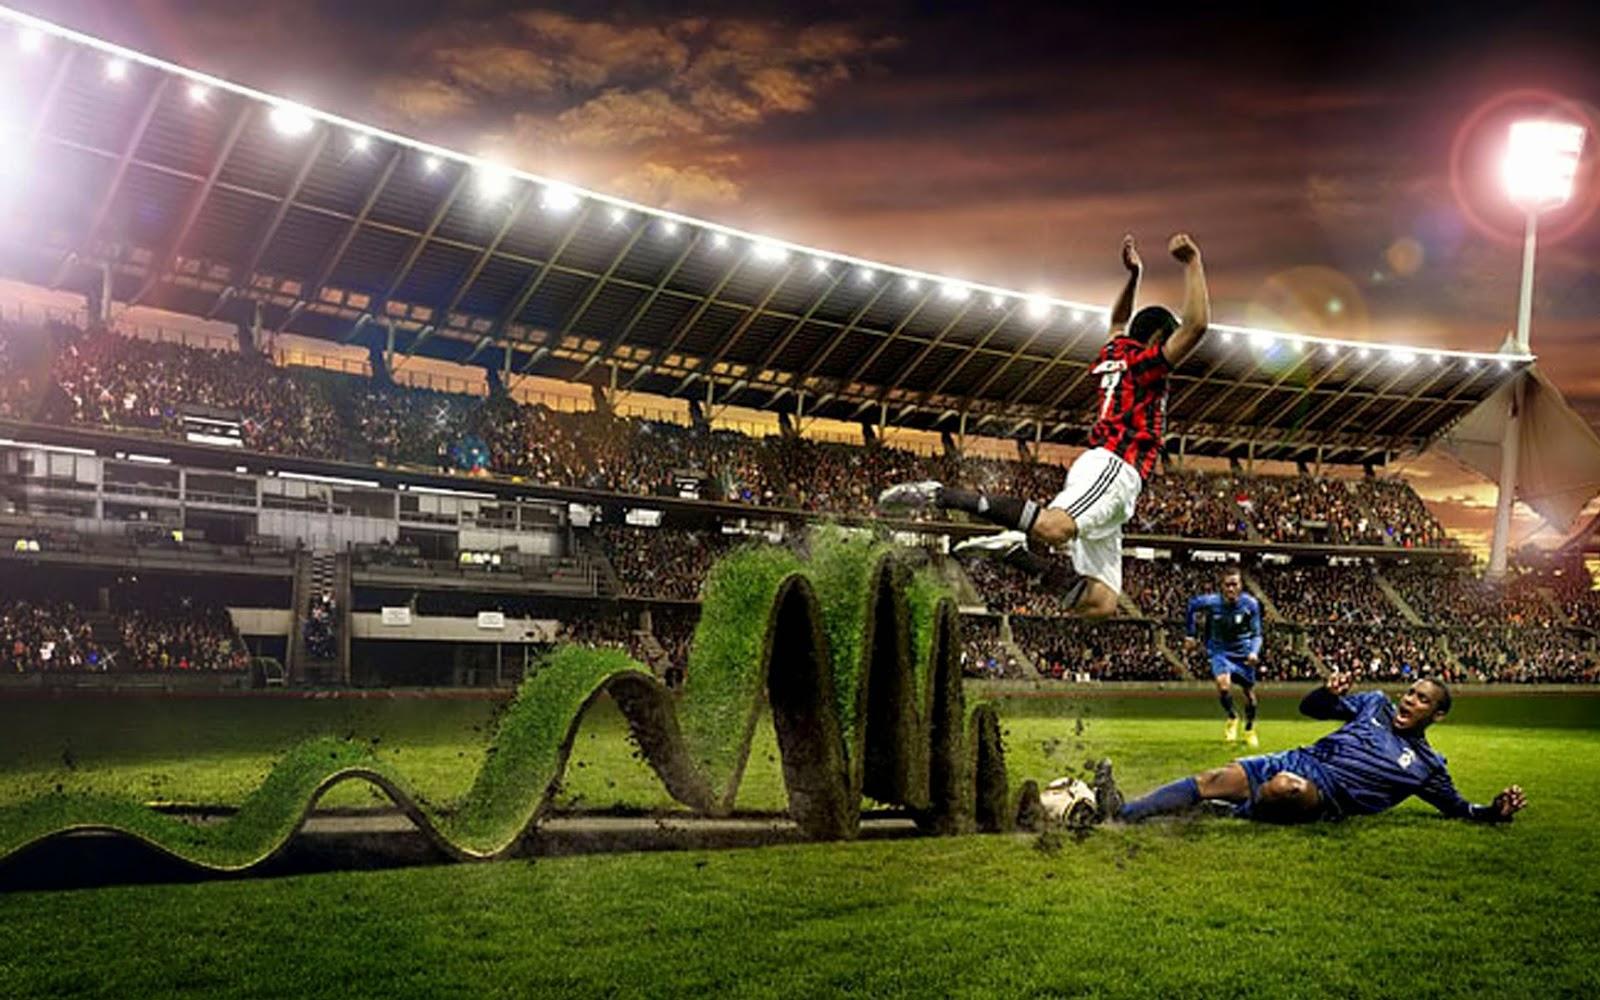 farag blog hd sports wallpapers 1080p